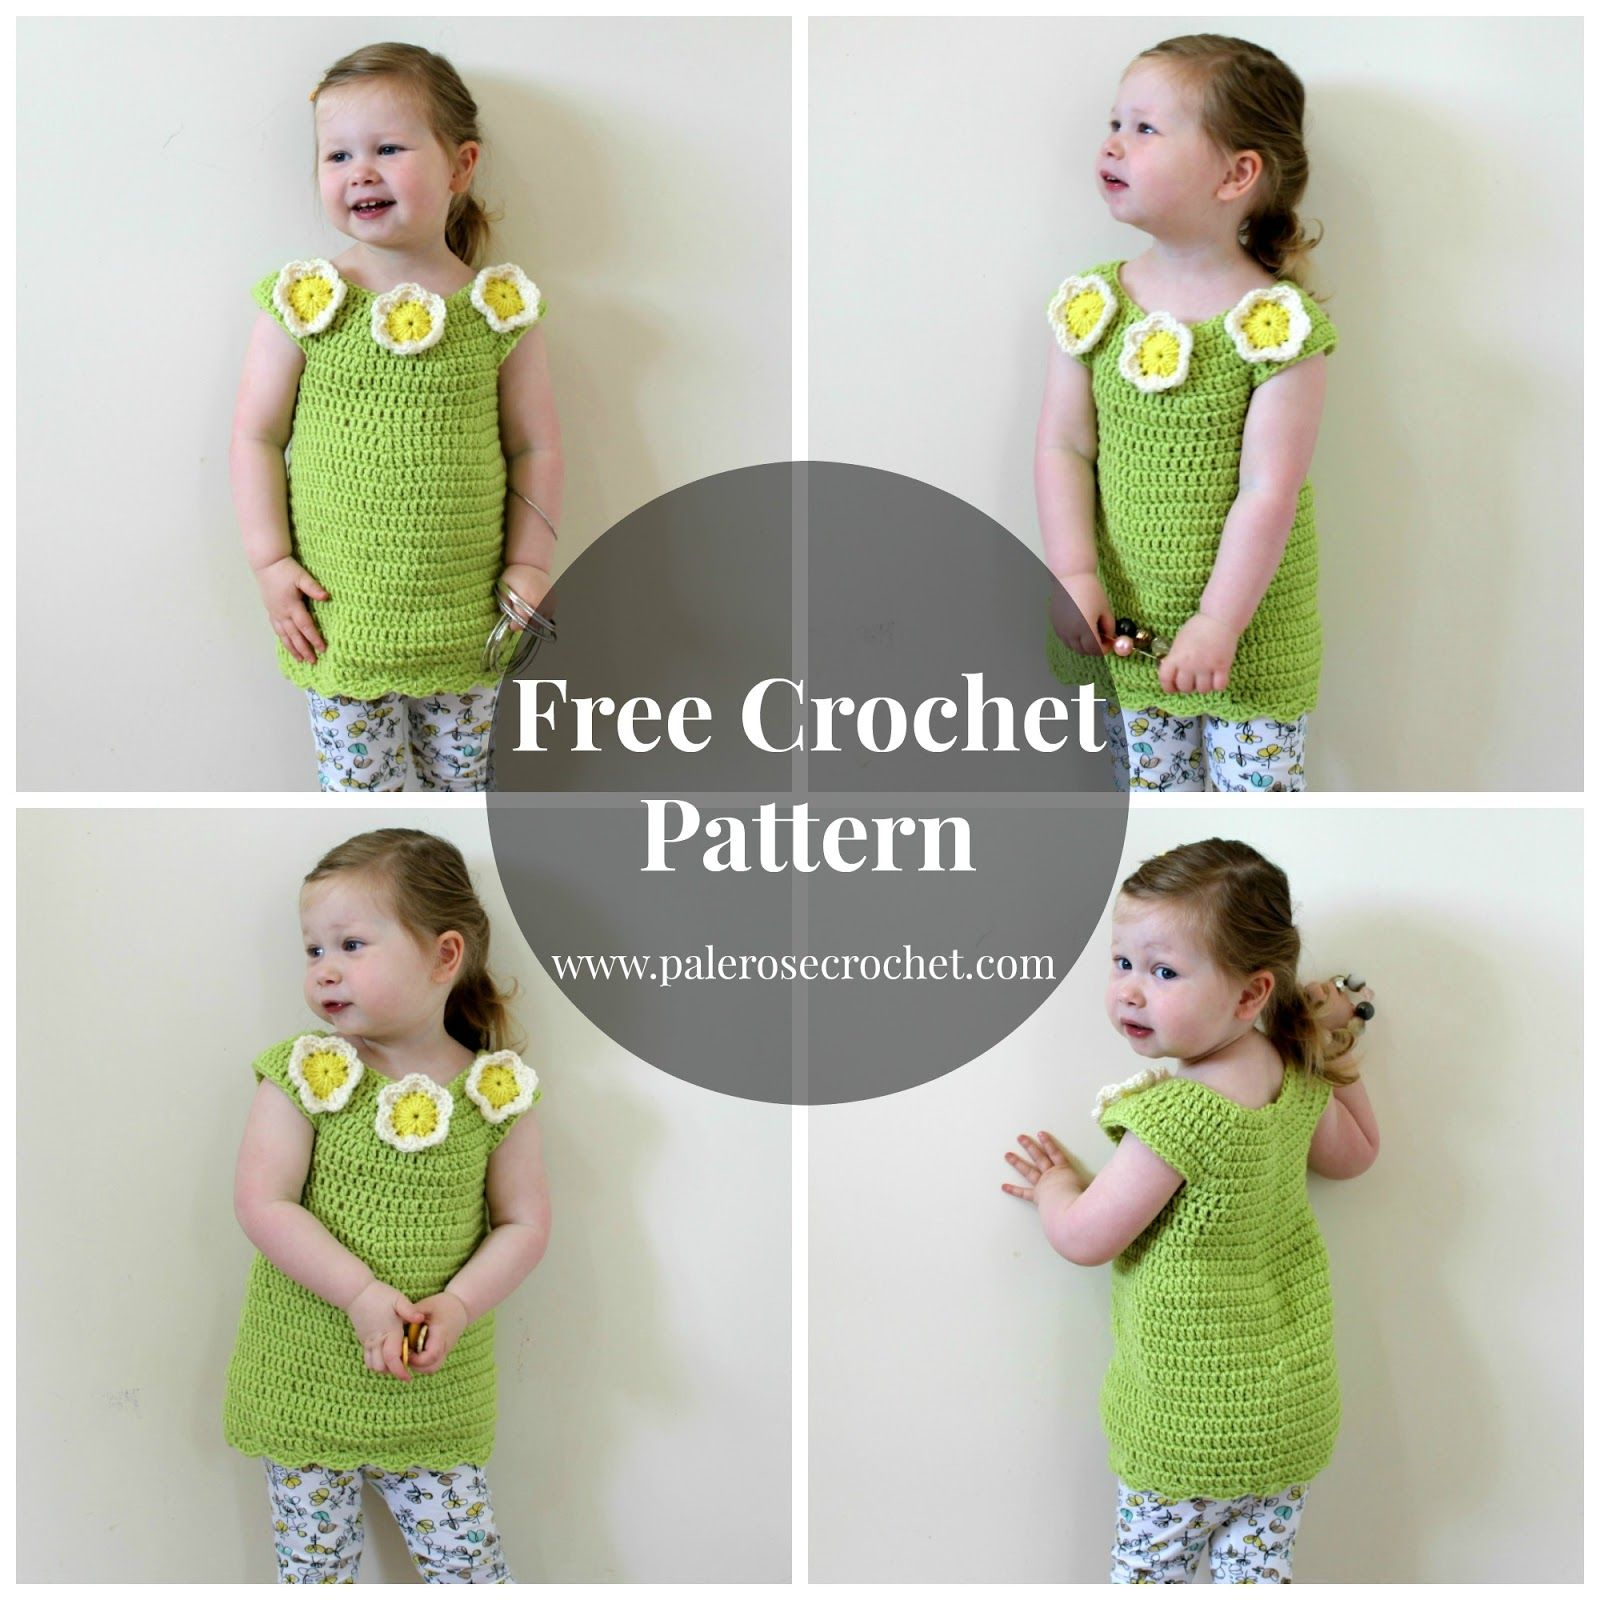 Toddler Flower Tunic Dress   Croquet stitches   Pinterest